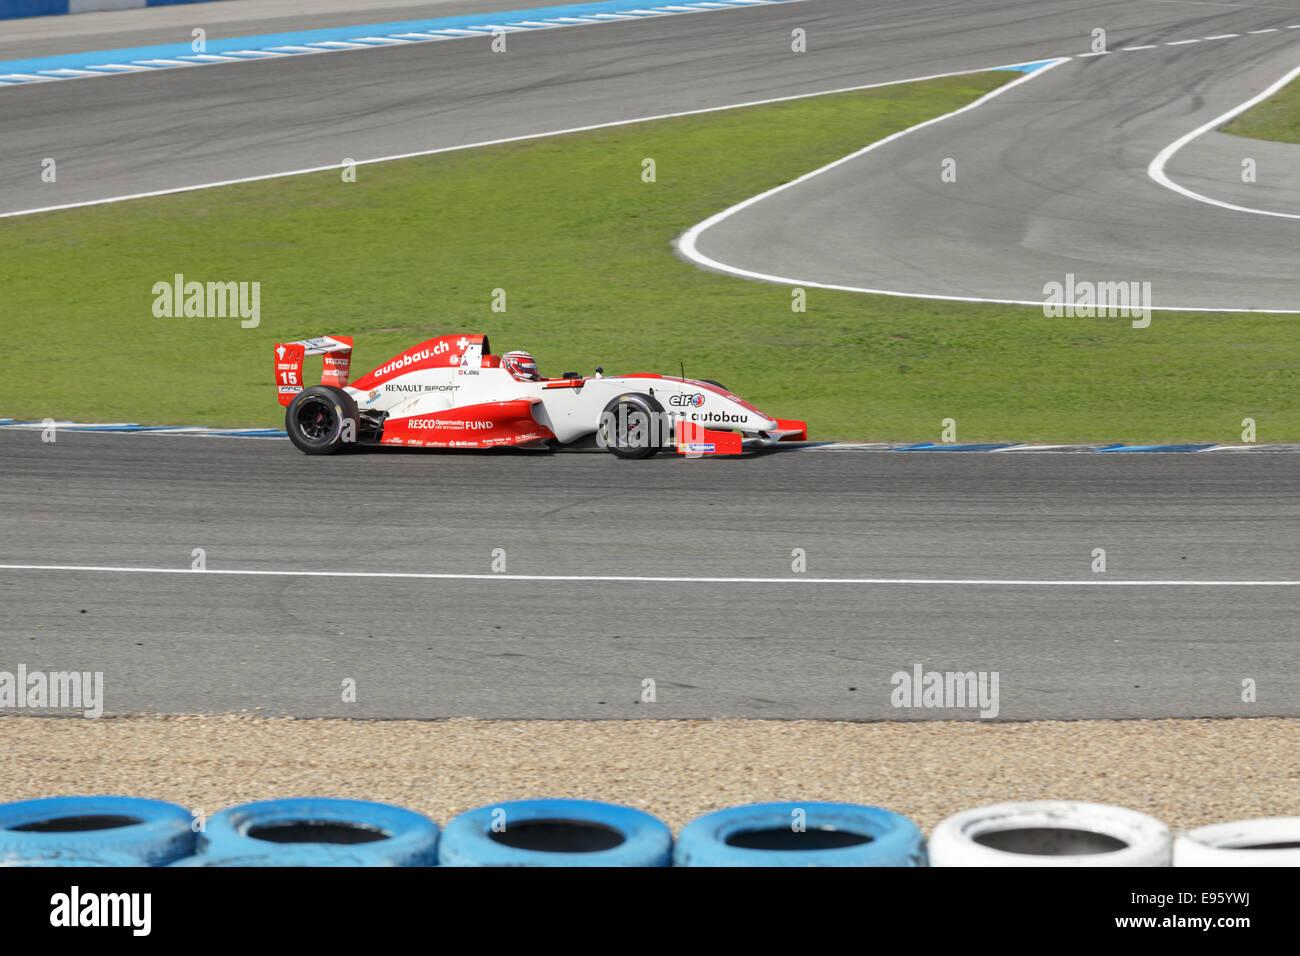 JEREZ DE LA FRONTERA, SPAIN - OCTOBER 19, 2014: Kevin Jorg of Josef Kaufmann Racing Team drives his car at Jerez - Stock Image